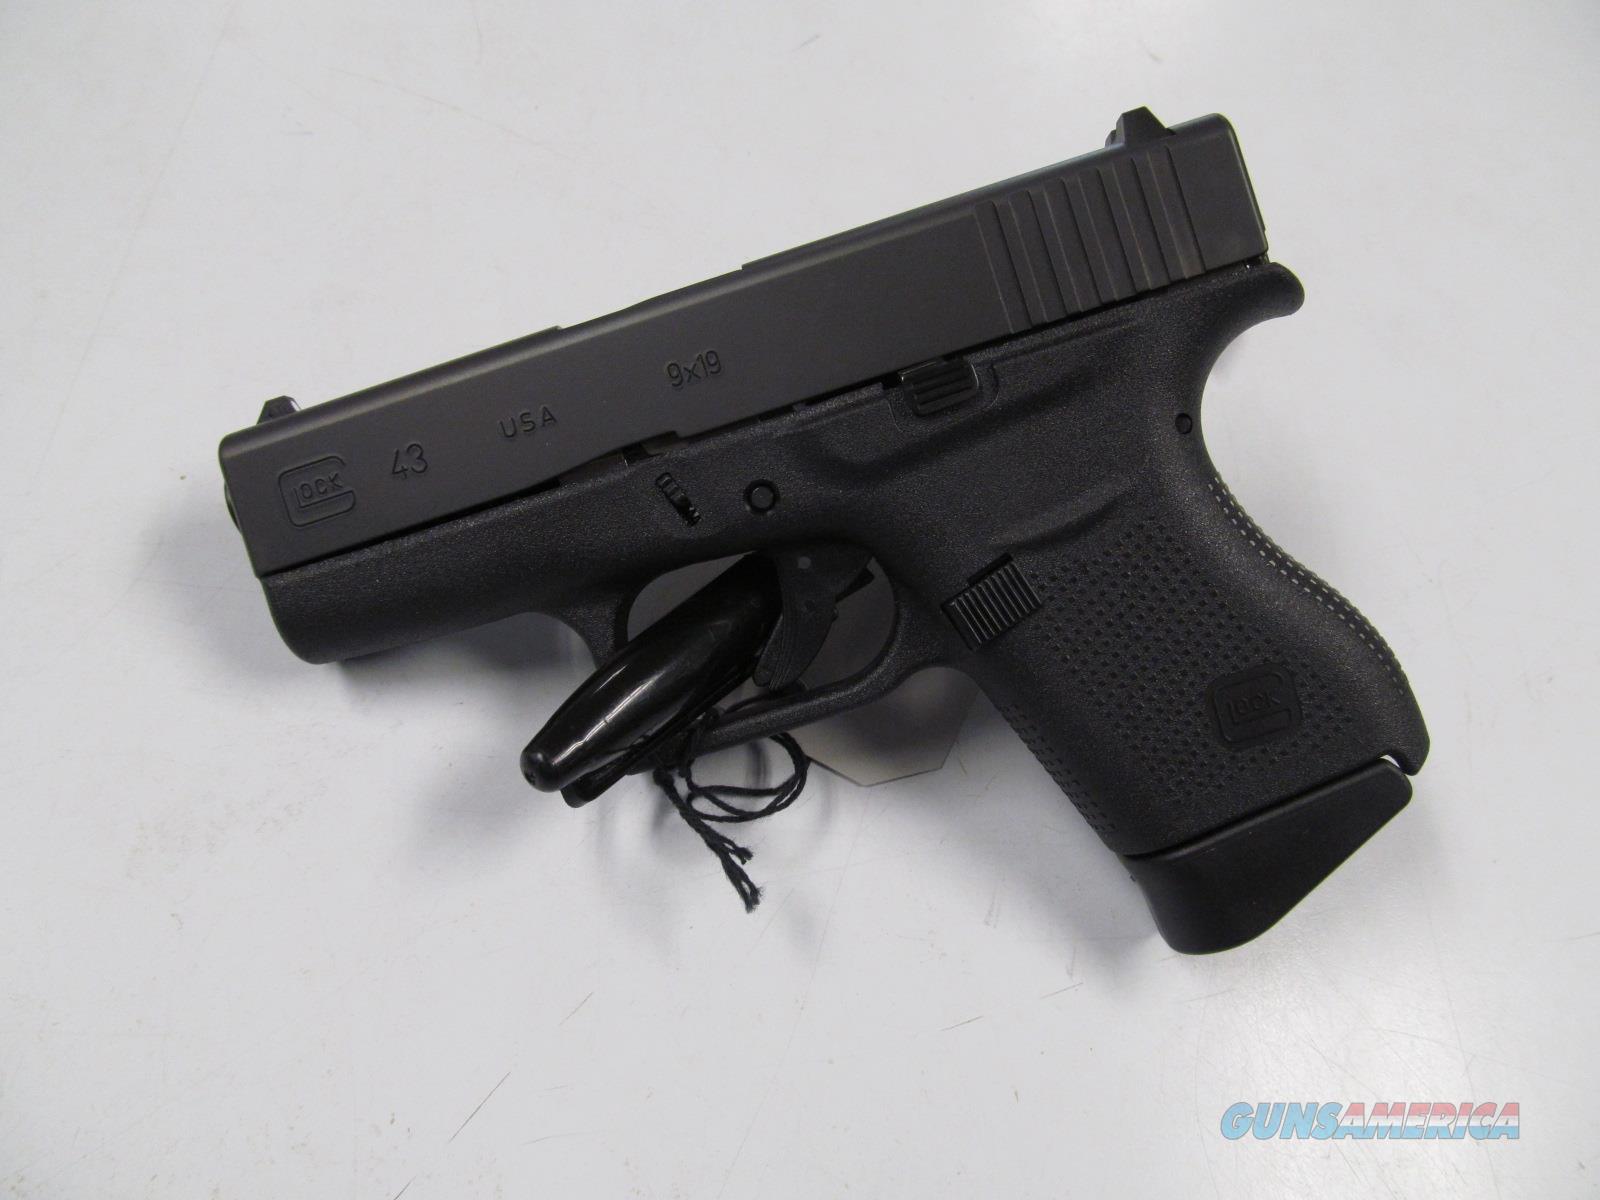 Glock 43 (UI4350201)  Guns > Pistols > Glock Pistols > 43/43X